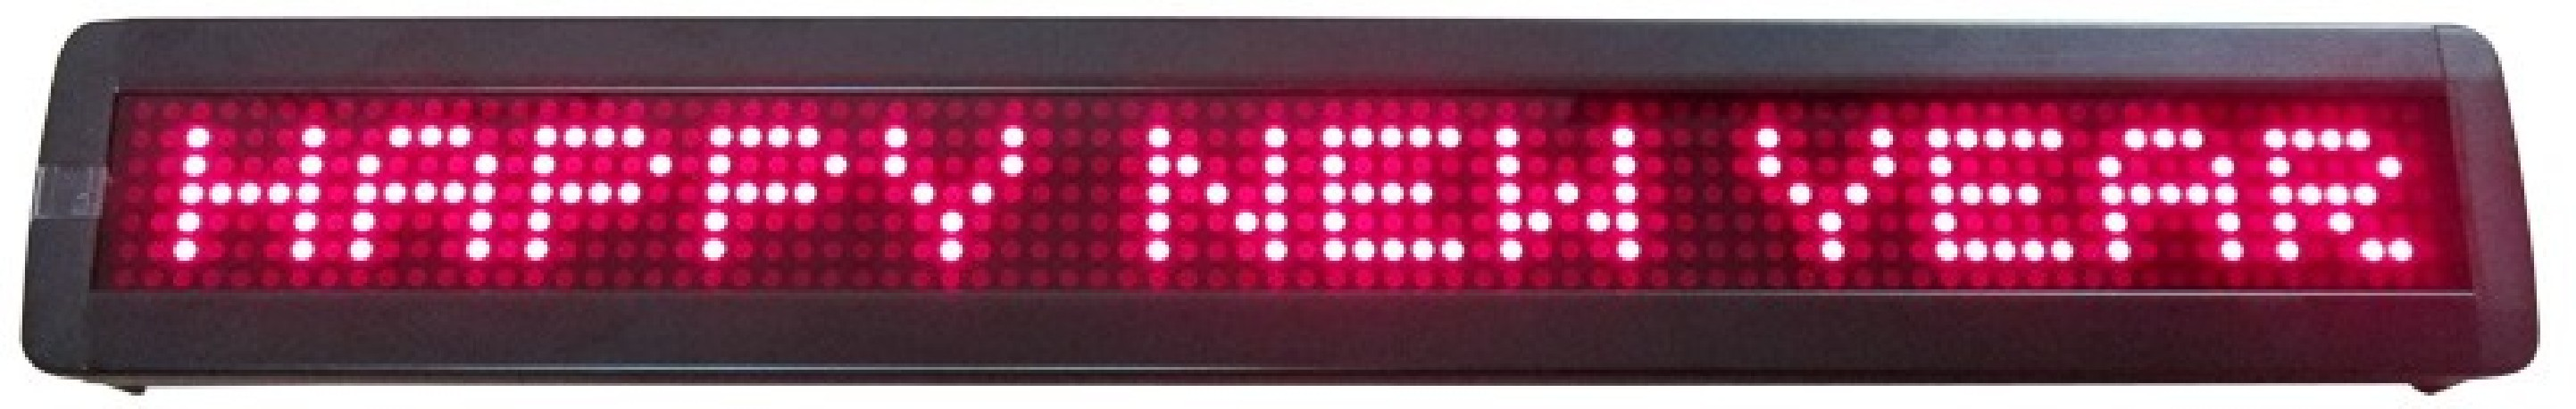 Journal Lumineux Ibiza MOVING MES15R